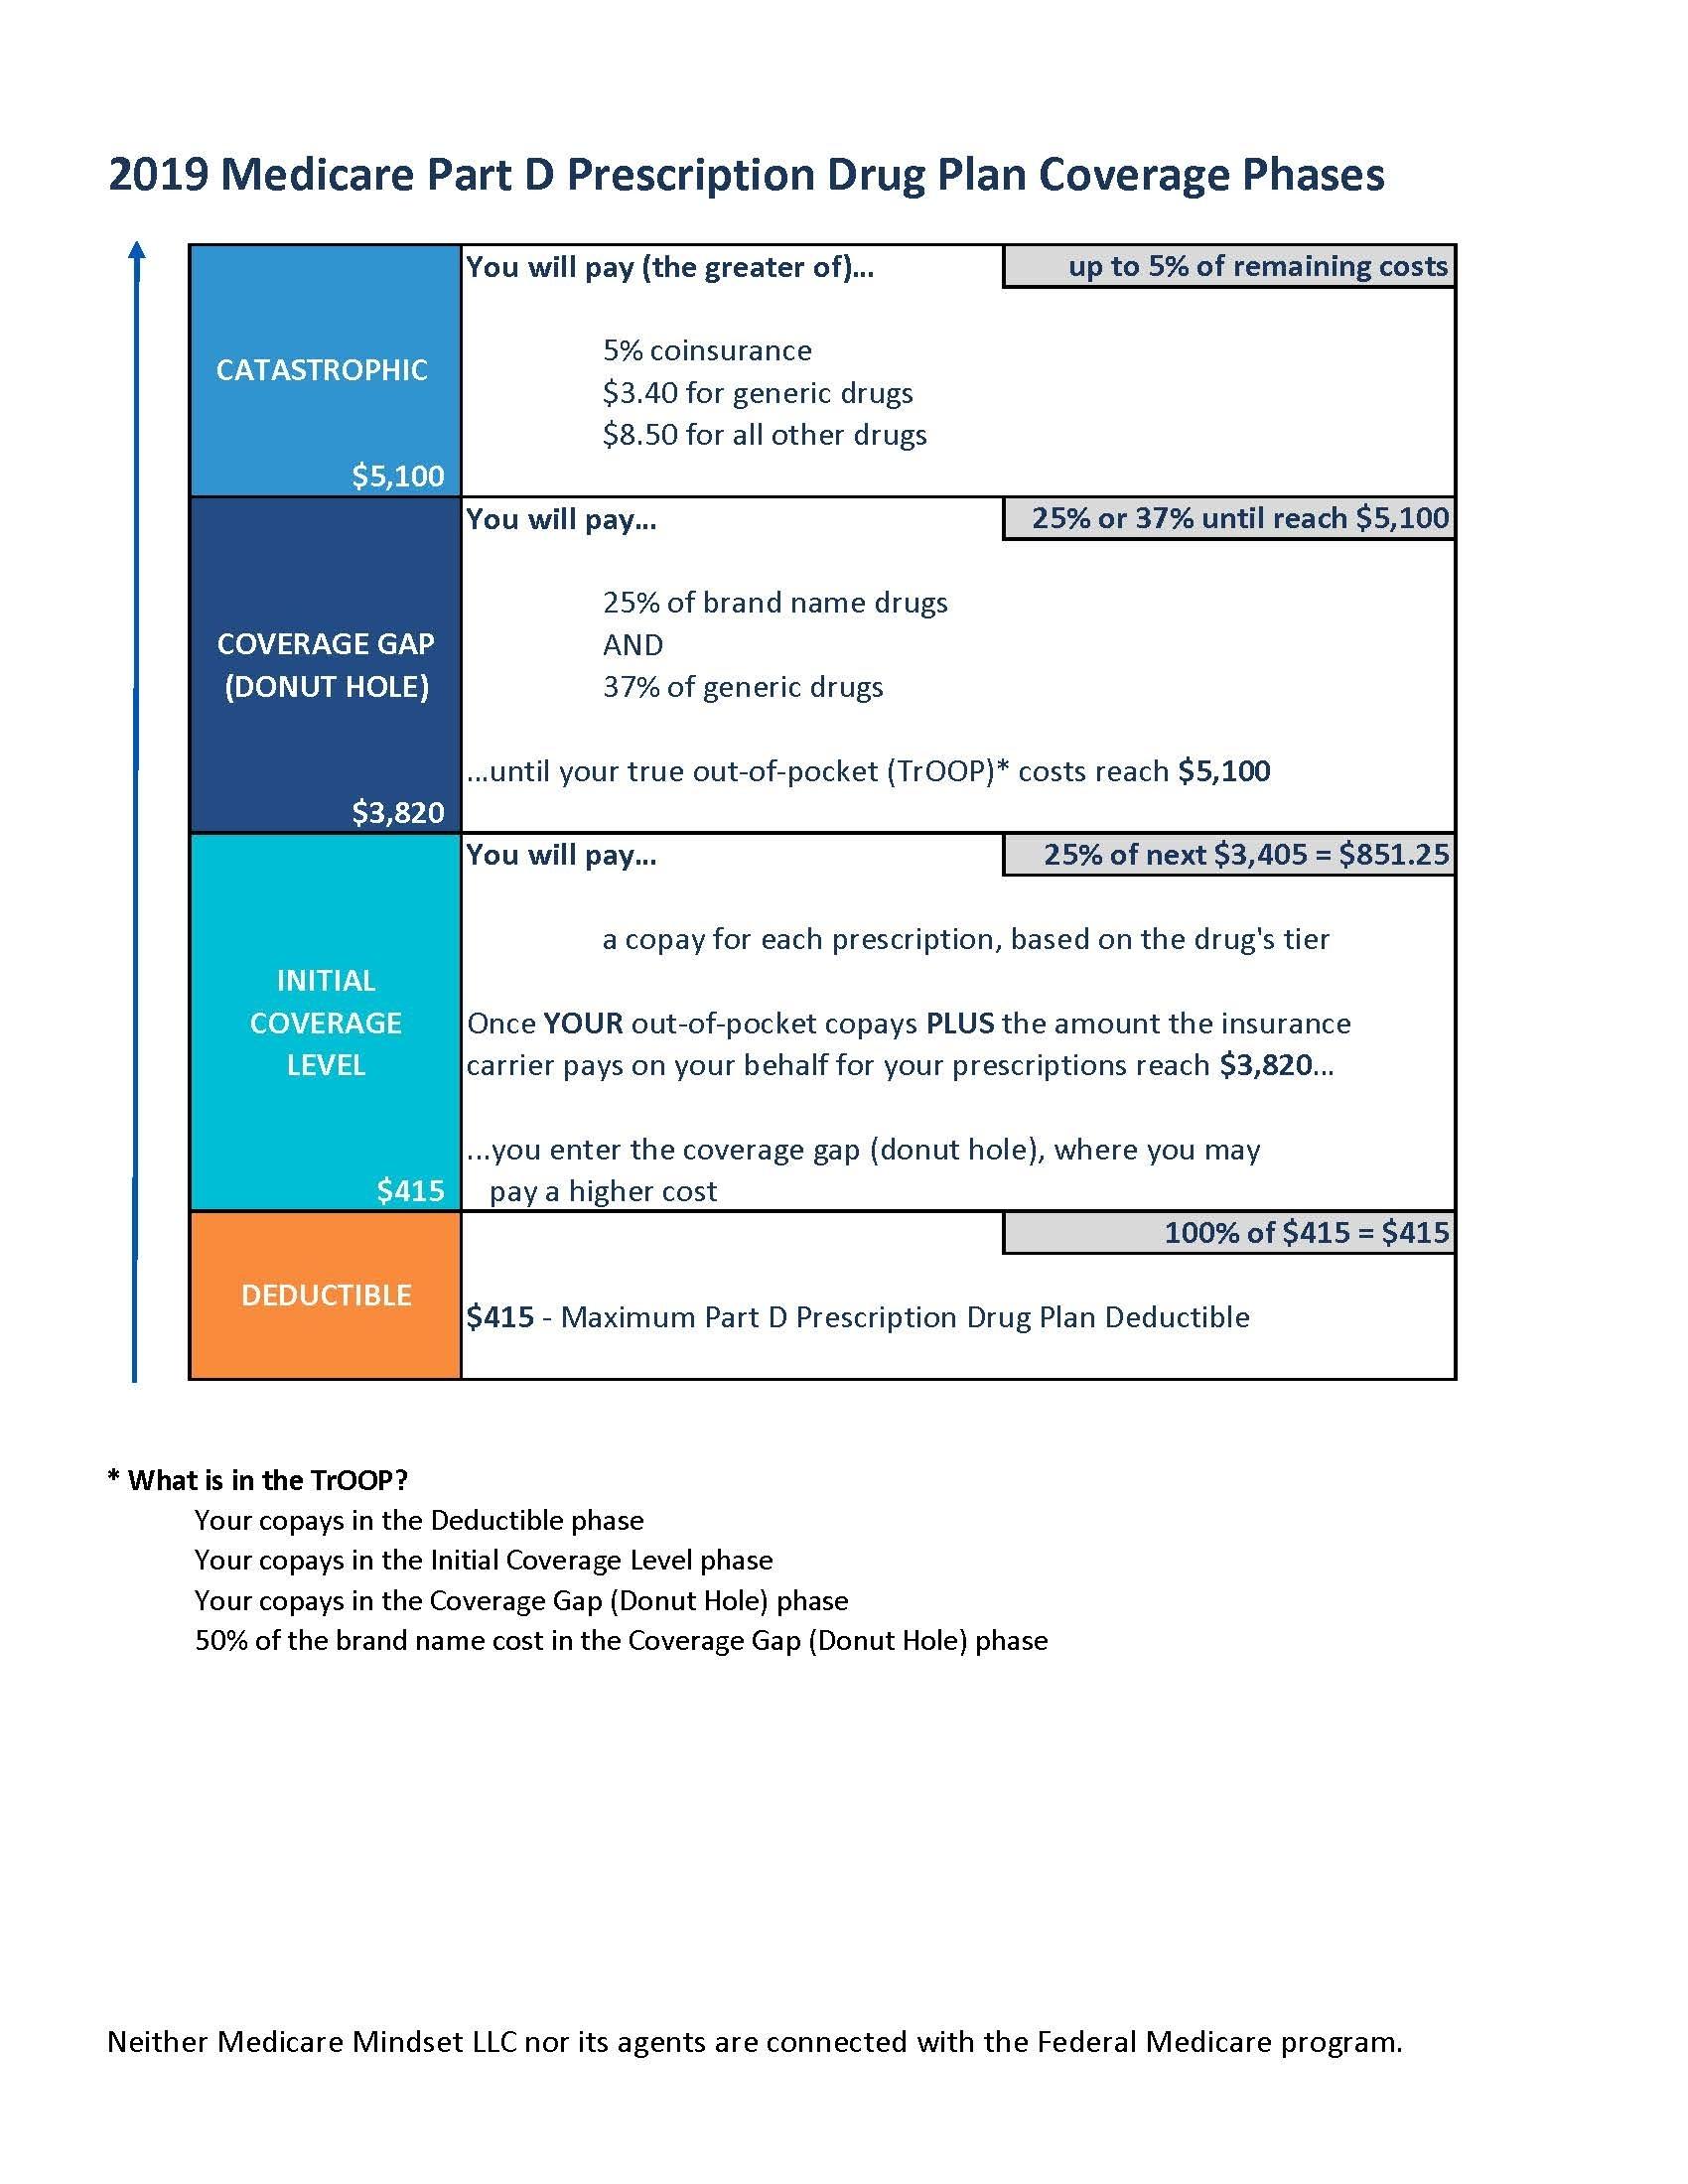 Defining The Donut Hole & Part D Phases | Medicare Mindset